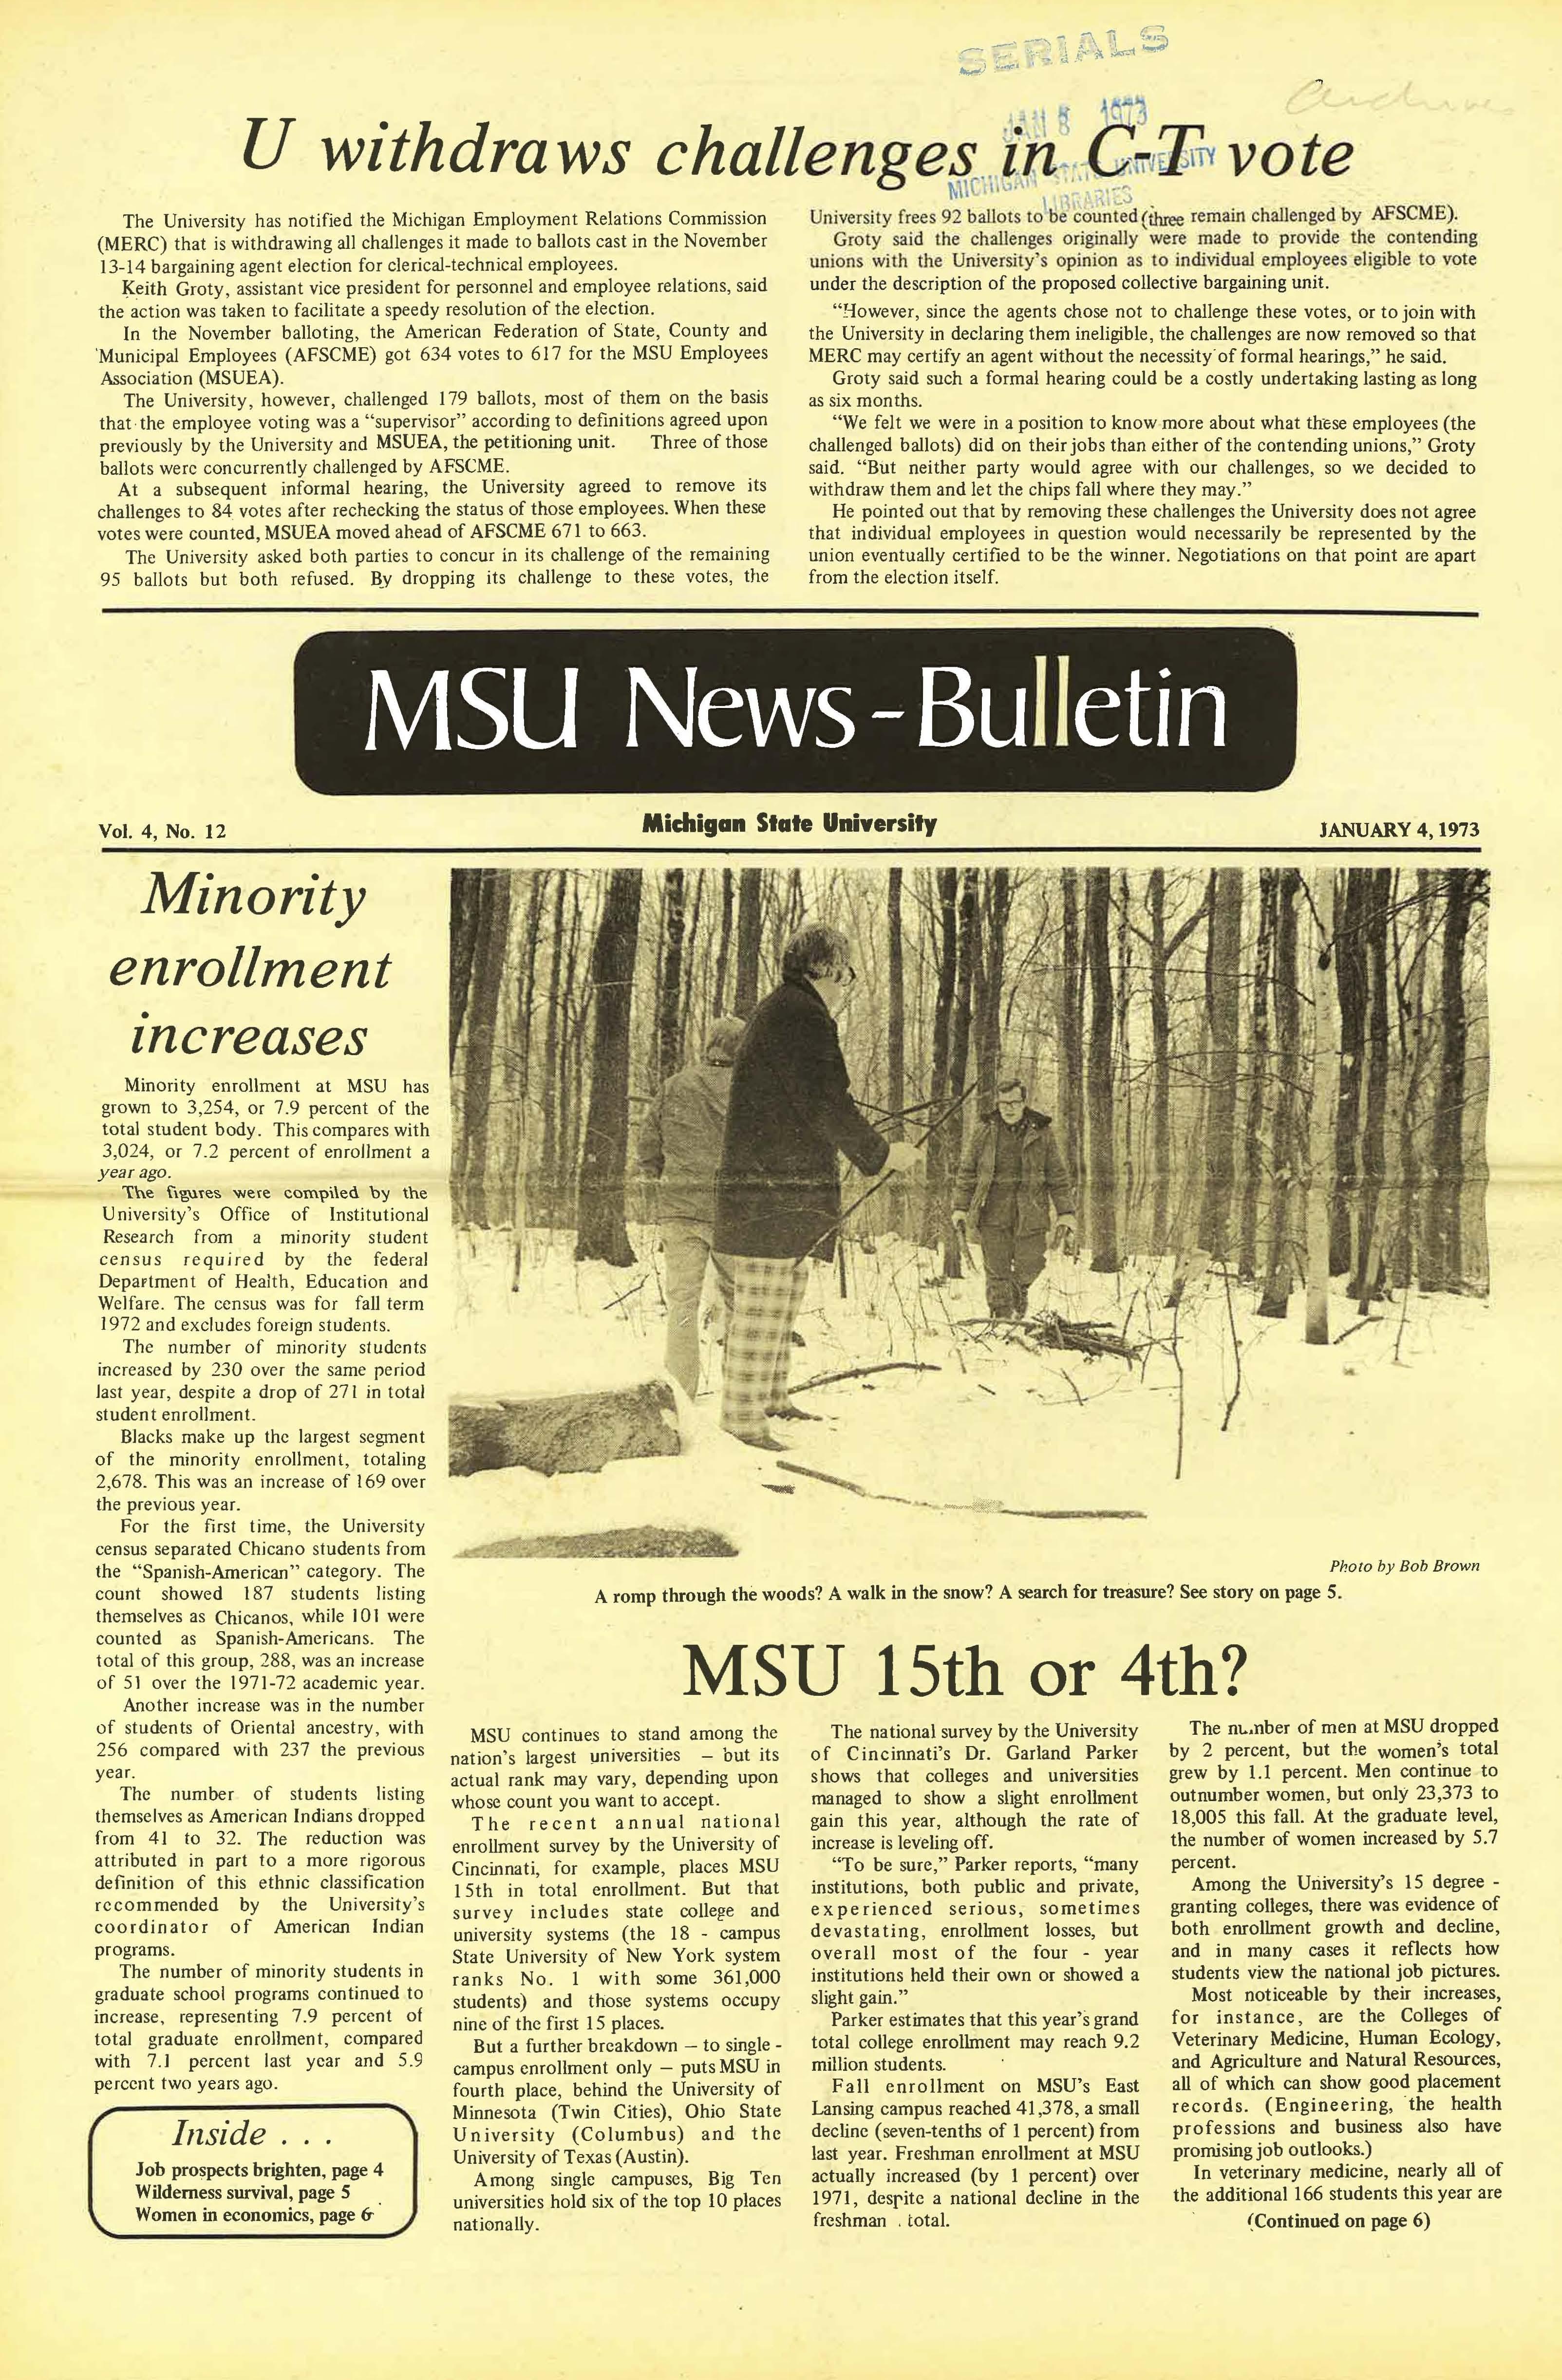 MSU News Bulletin, vol. 4, No. 12, January 4, 1973